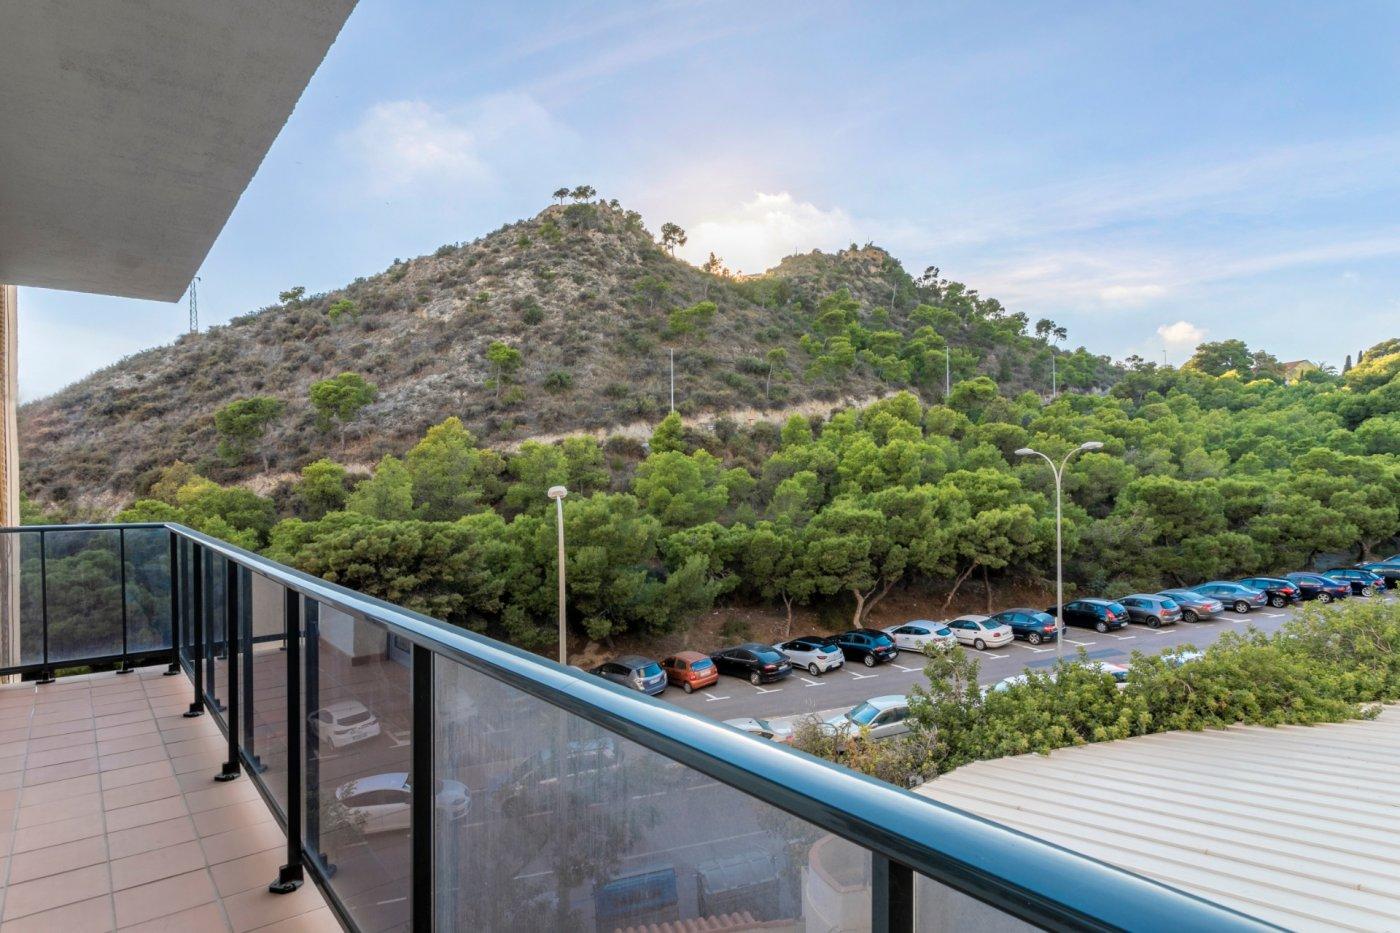 Mieszkanie w Alicante przy Monte Benacantil, 10 min od Playa Postiguet